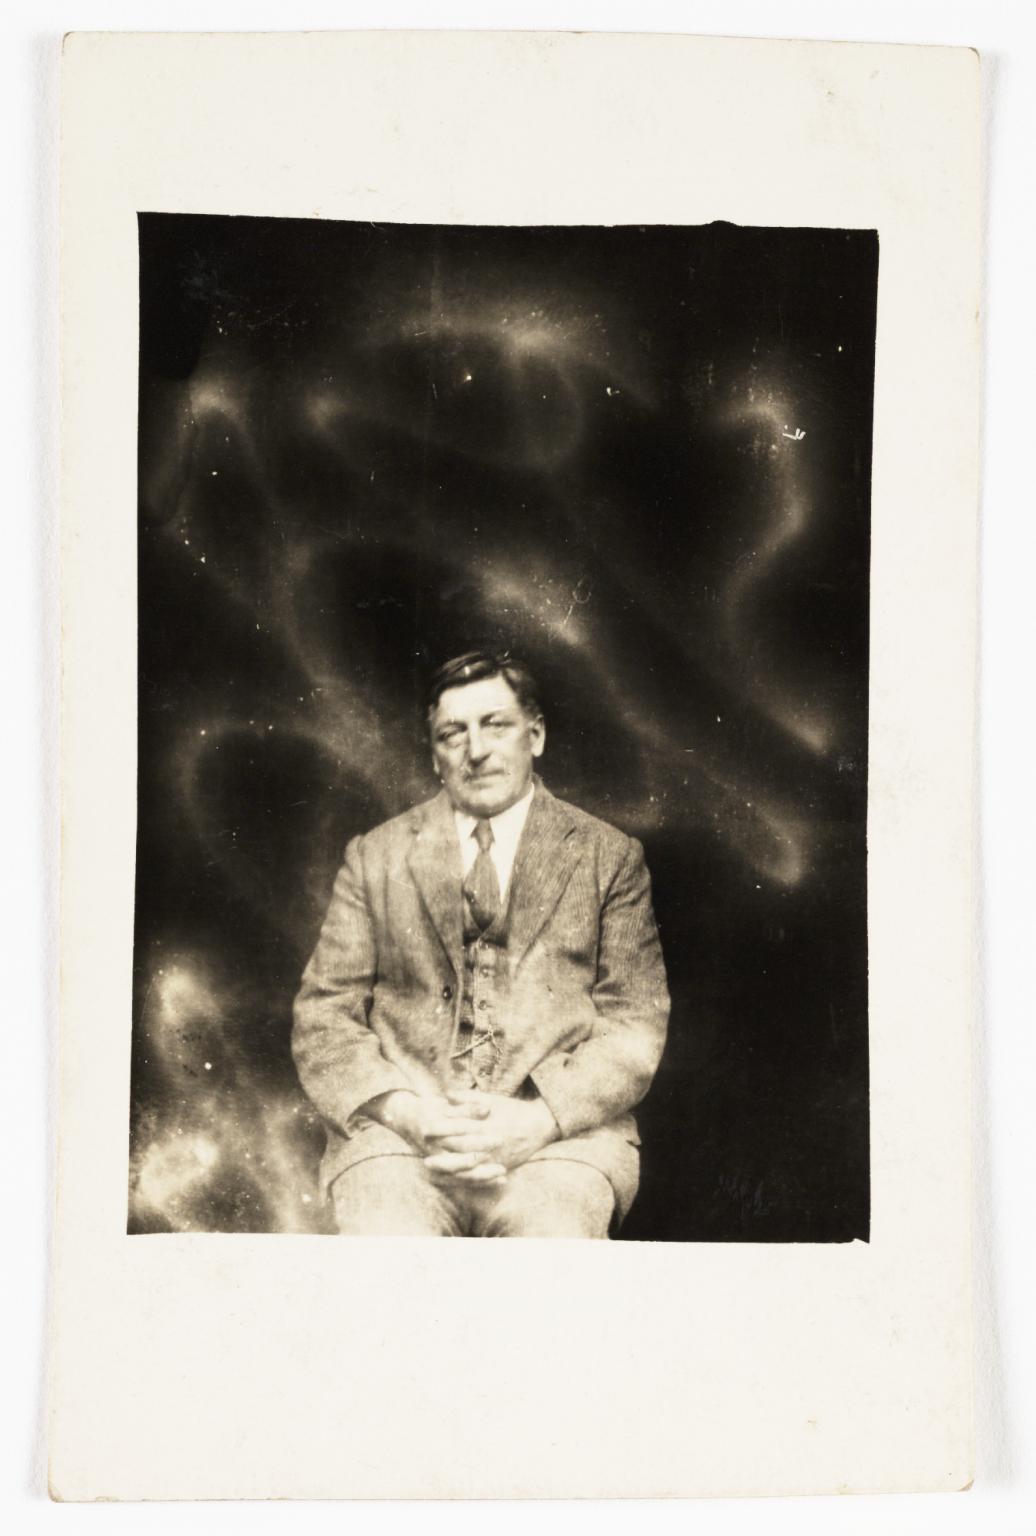 Spirit photograph by William Hope, c. 1920